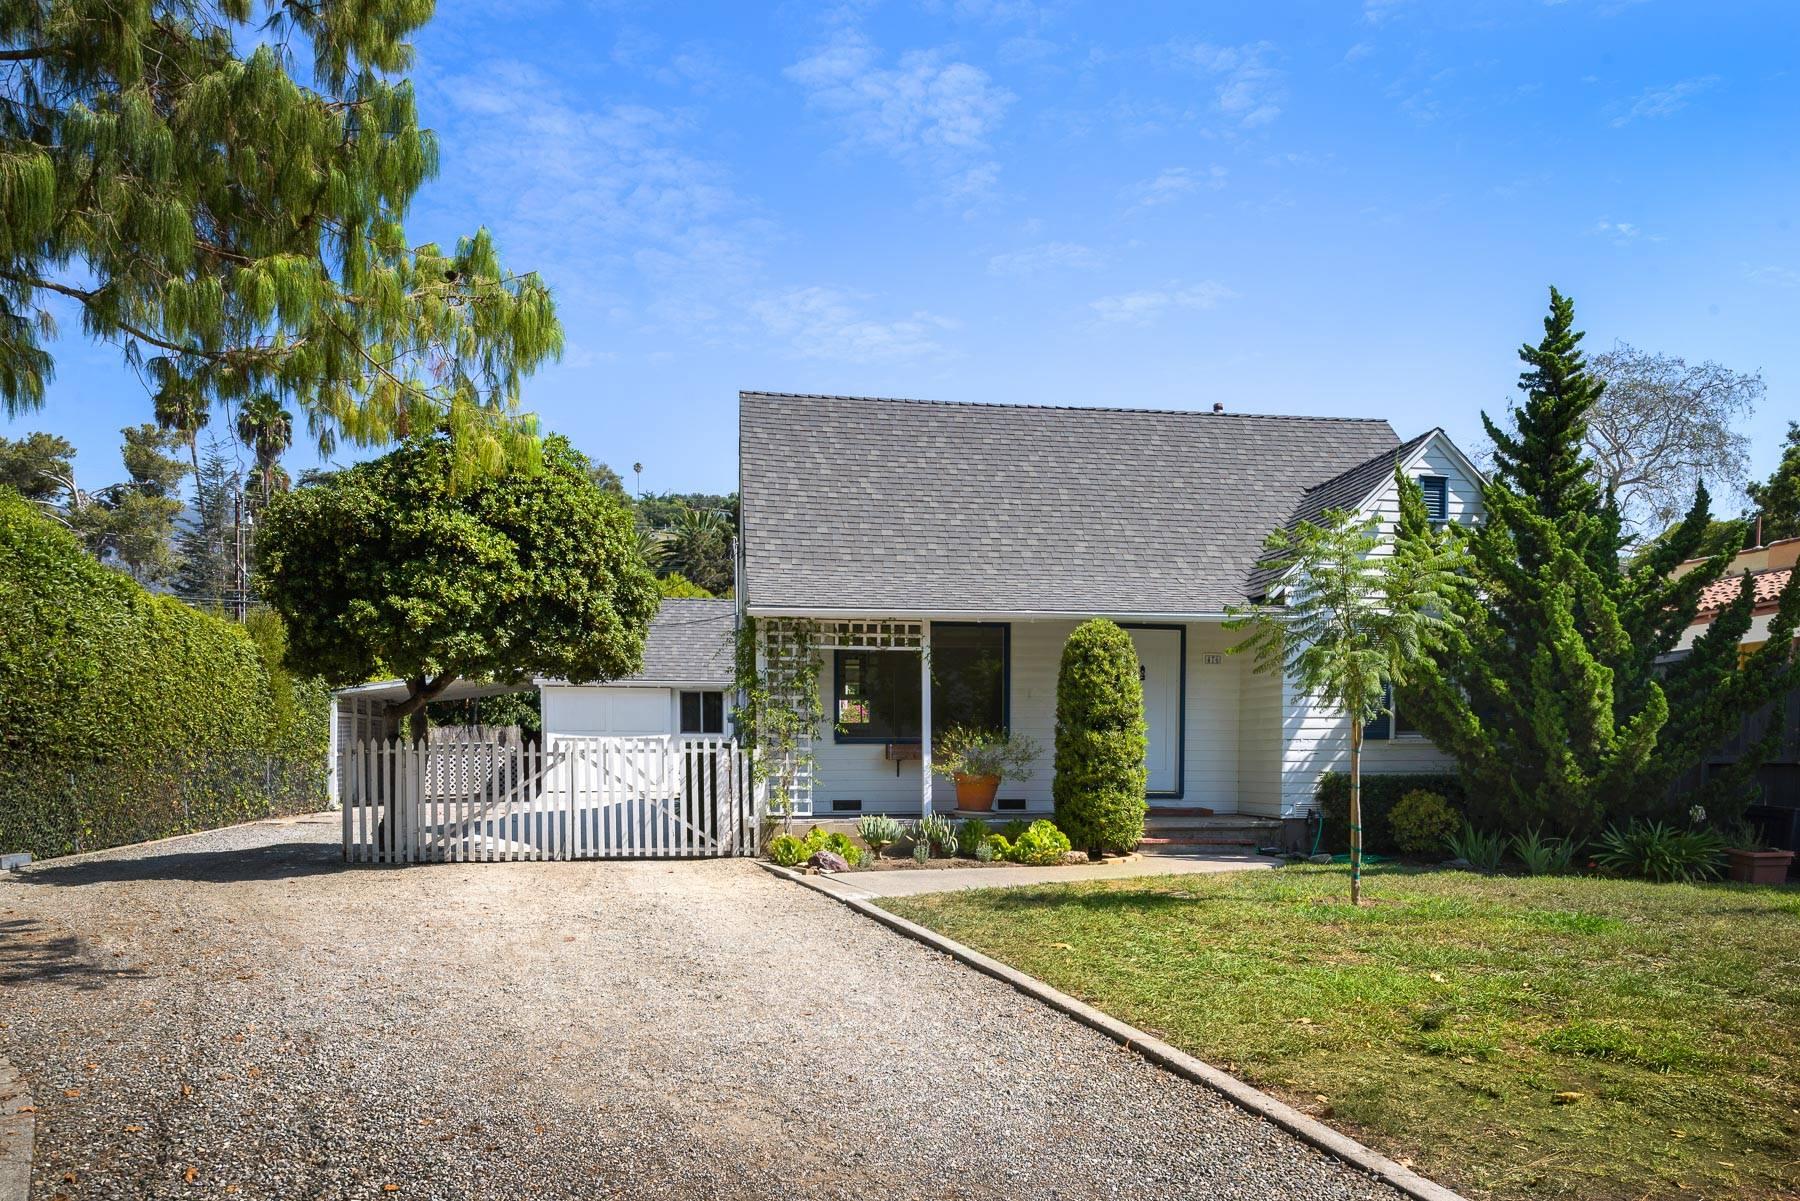 Charming San Roque Farmhouse with detached Art Studio